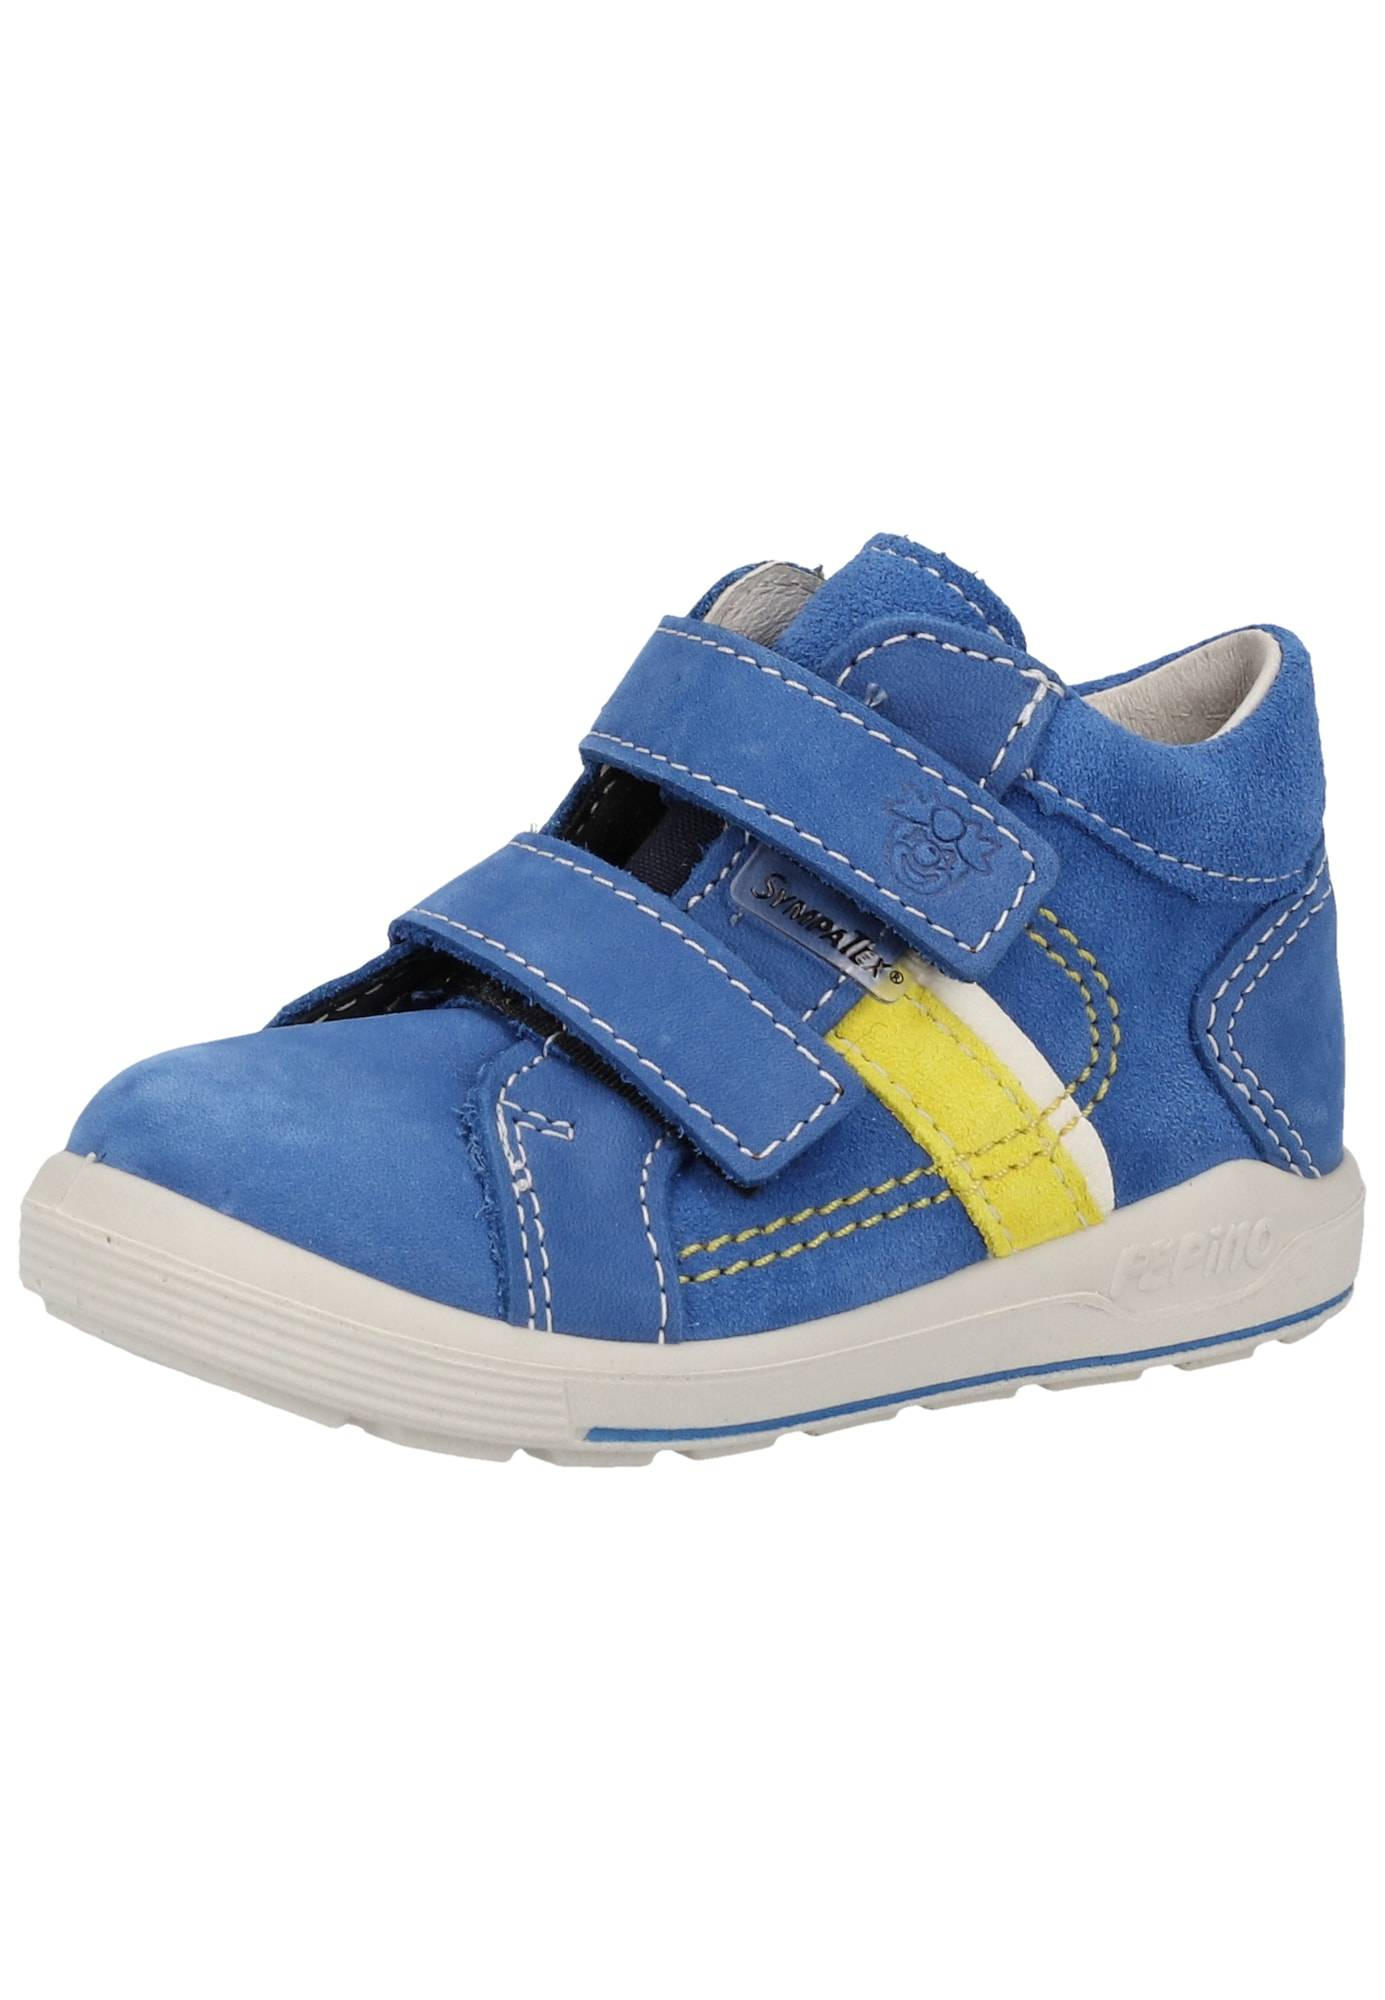 Pepino Baskets  - Bleu - Taille: 27 - boy